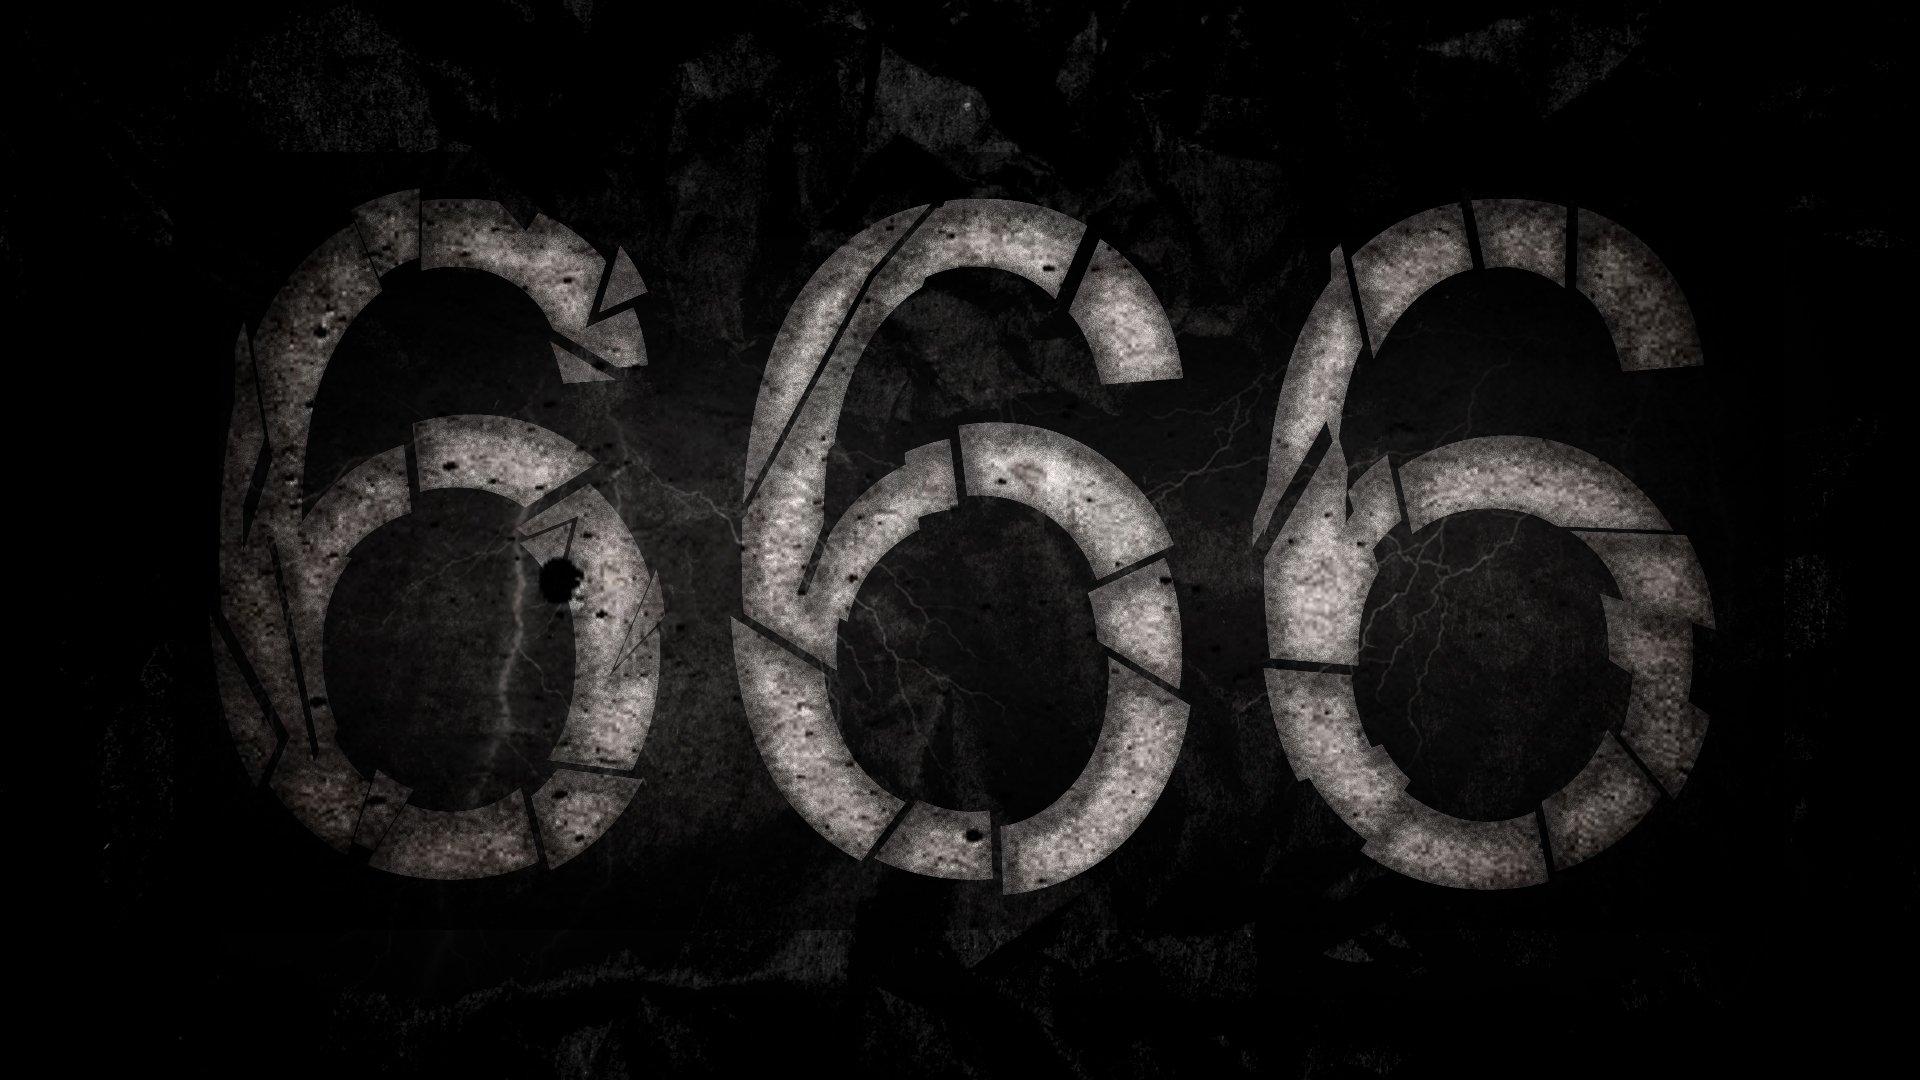 Occult satan satanic 666 evil wallpaper 1920x1080 324577 1920x1080